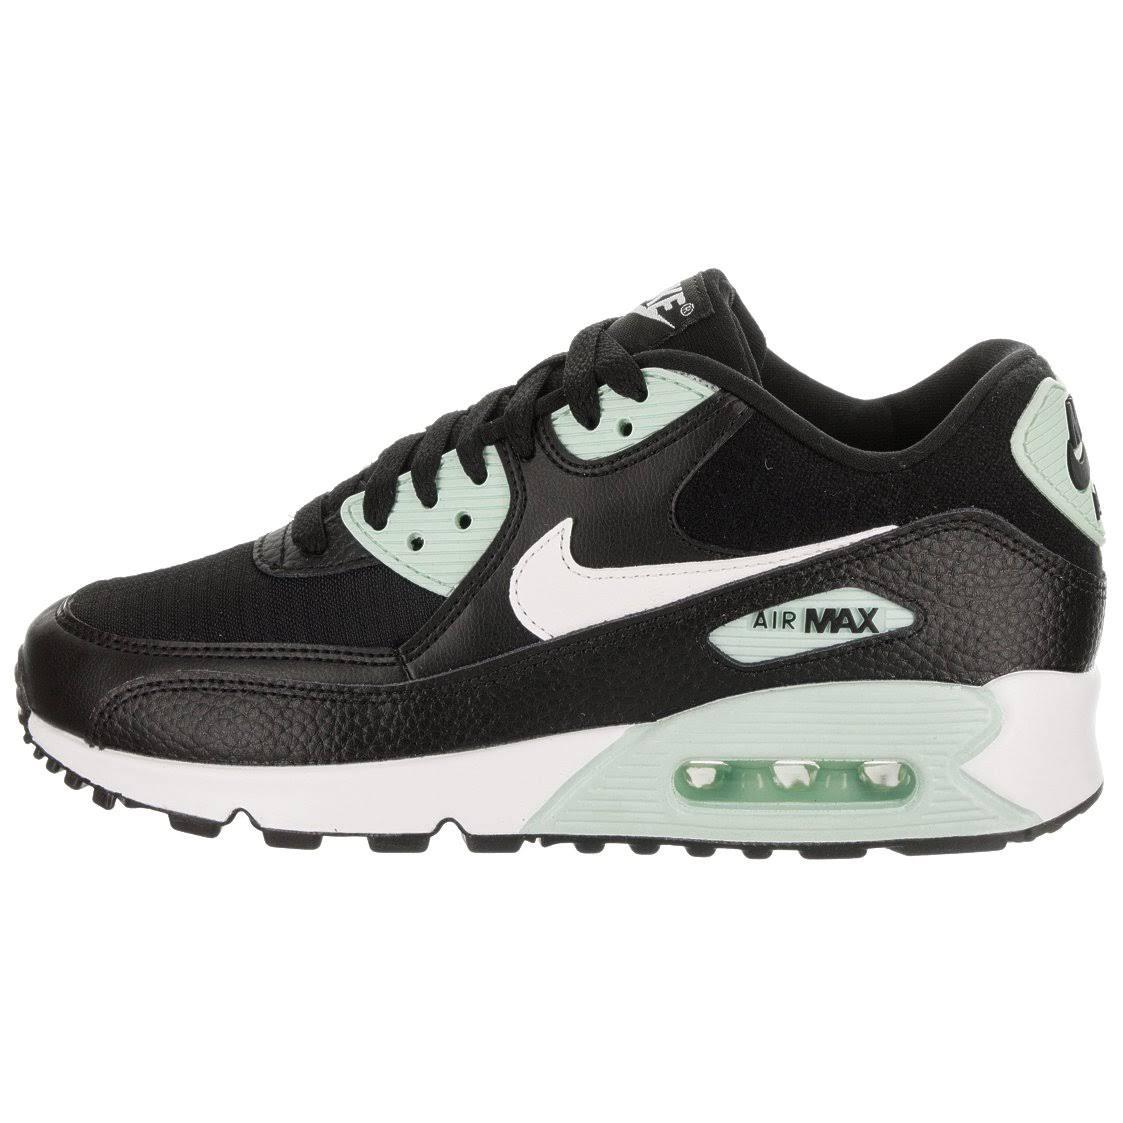 Witiglo Nike Women's wit Zwarttop 90 Schoenen Max Air nOvm08Nw